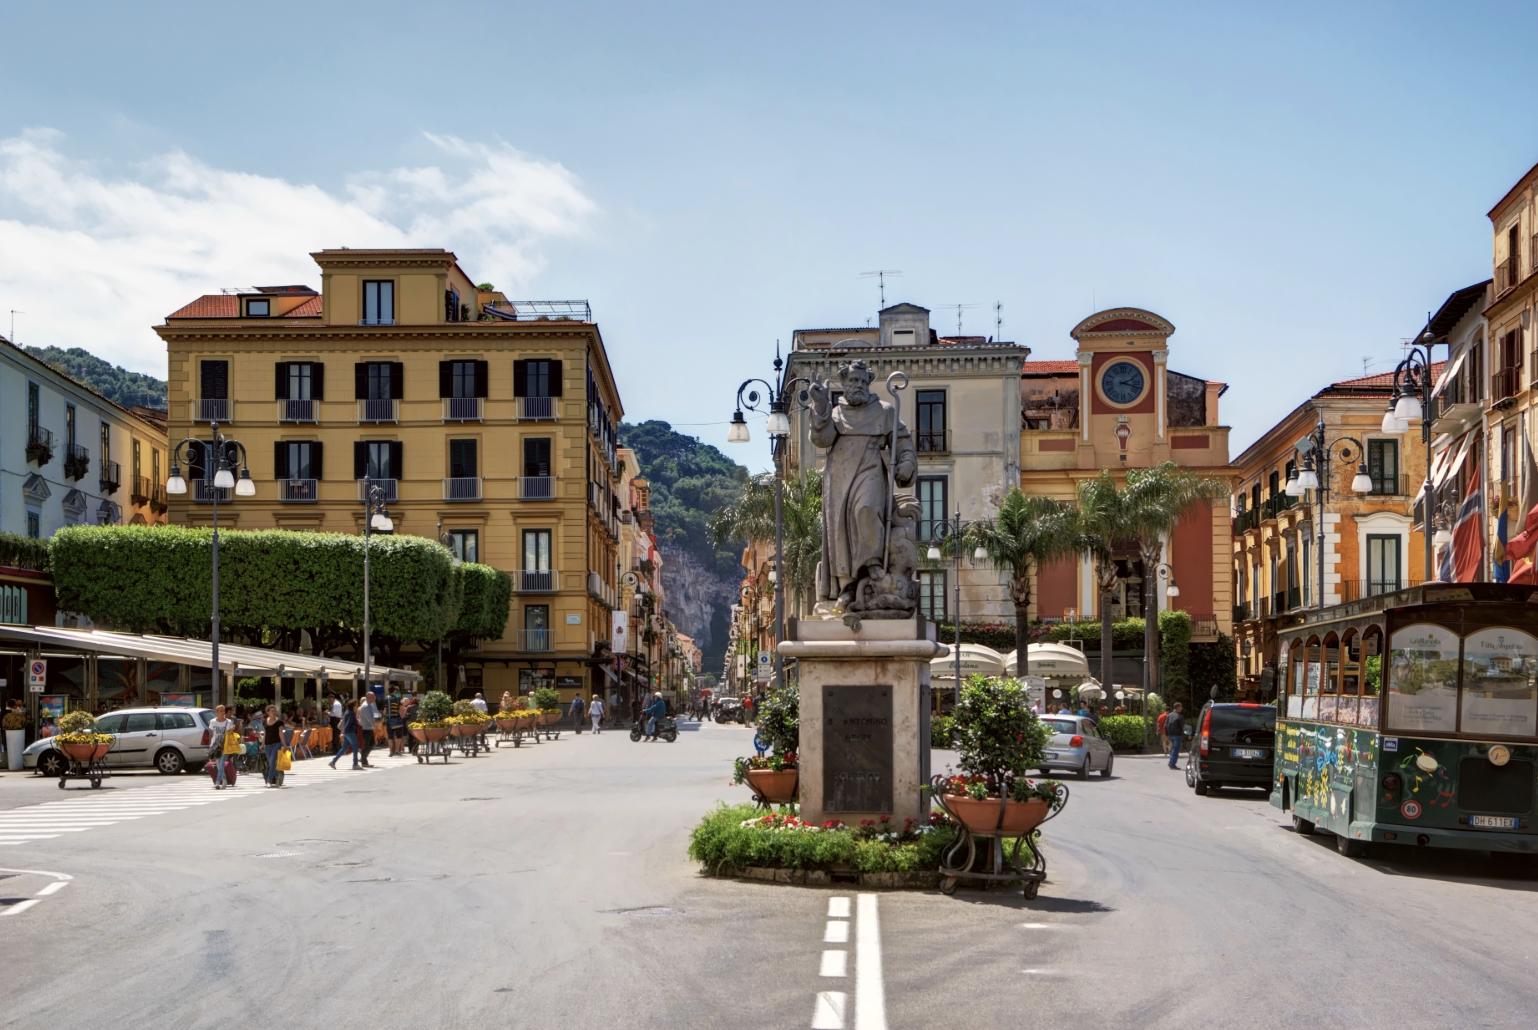 Piazza Tasso, Sorrento